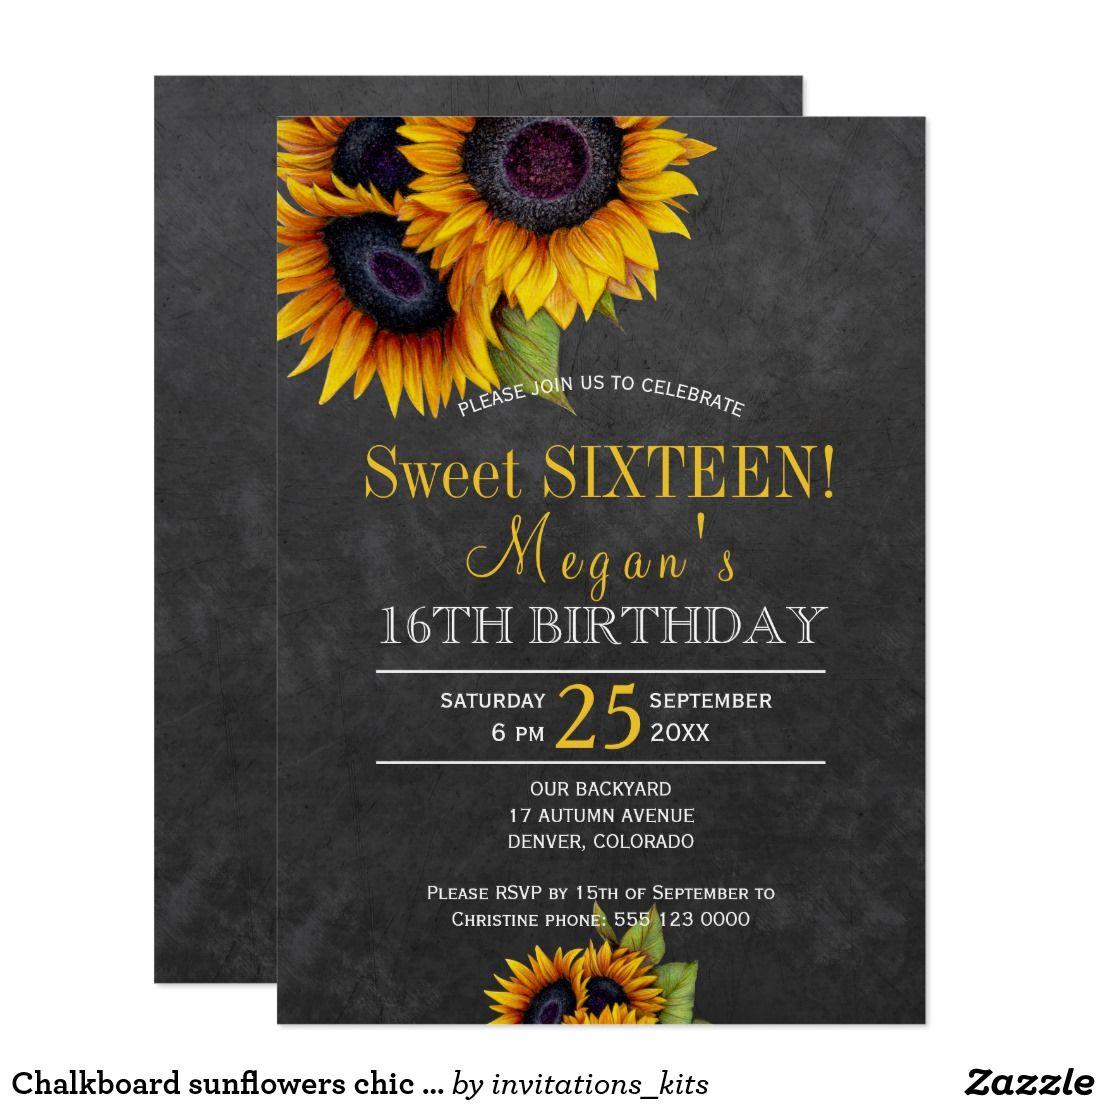 chalkboard sunflowers chic rustic sweet sixteen invitation in 2018